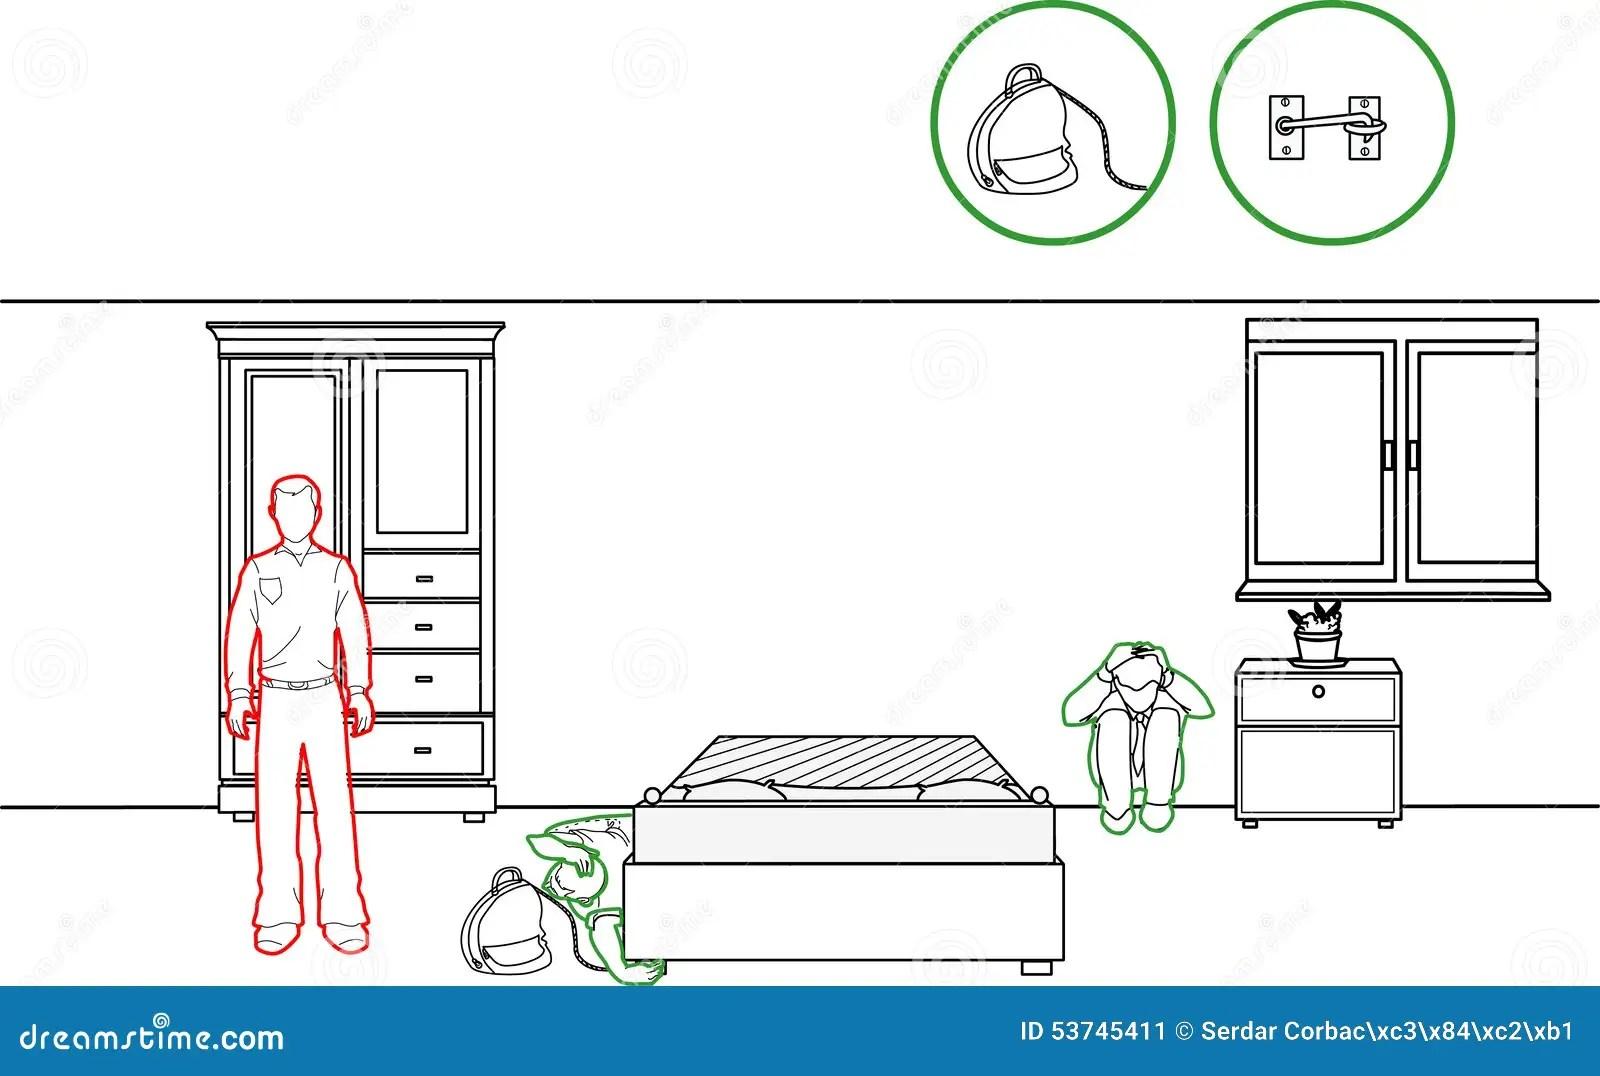 Earthquake Protection Methods Stock Vector Illustration